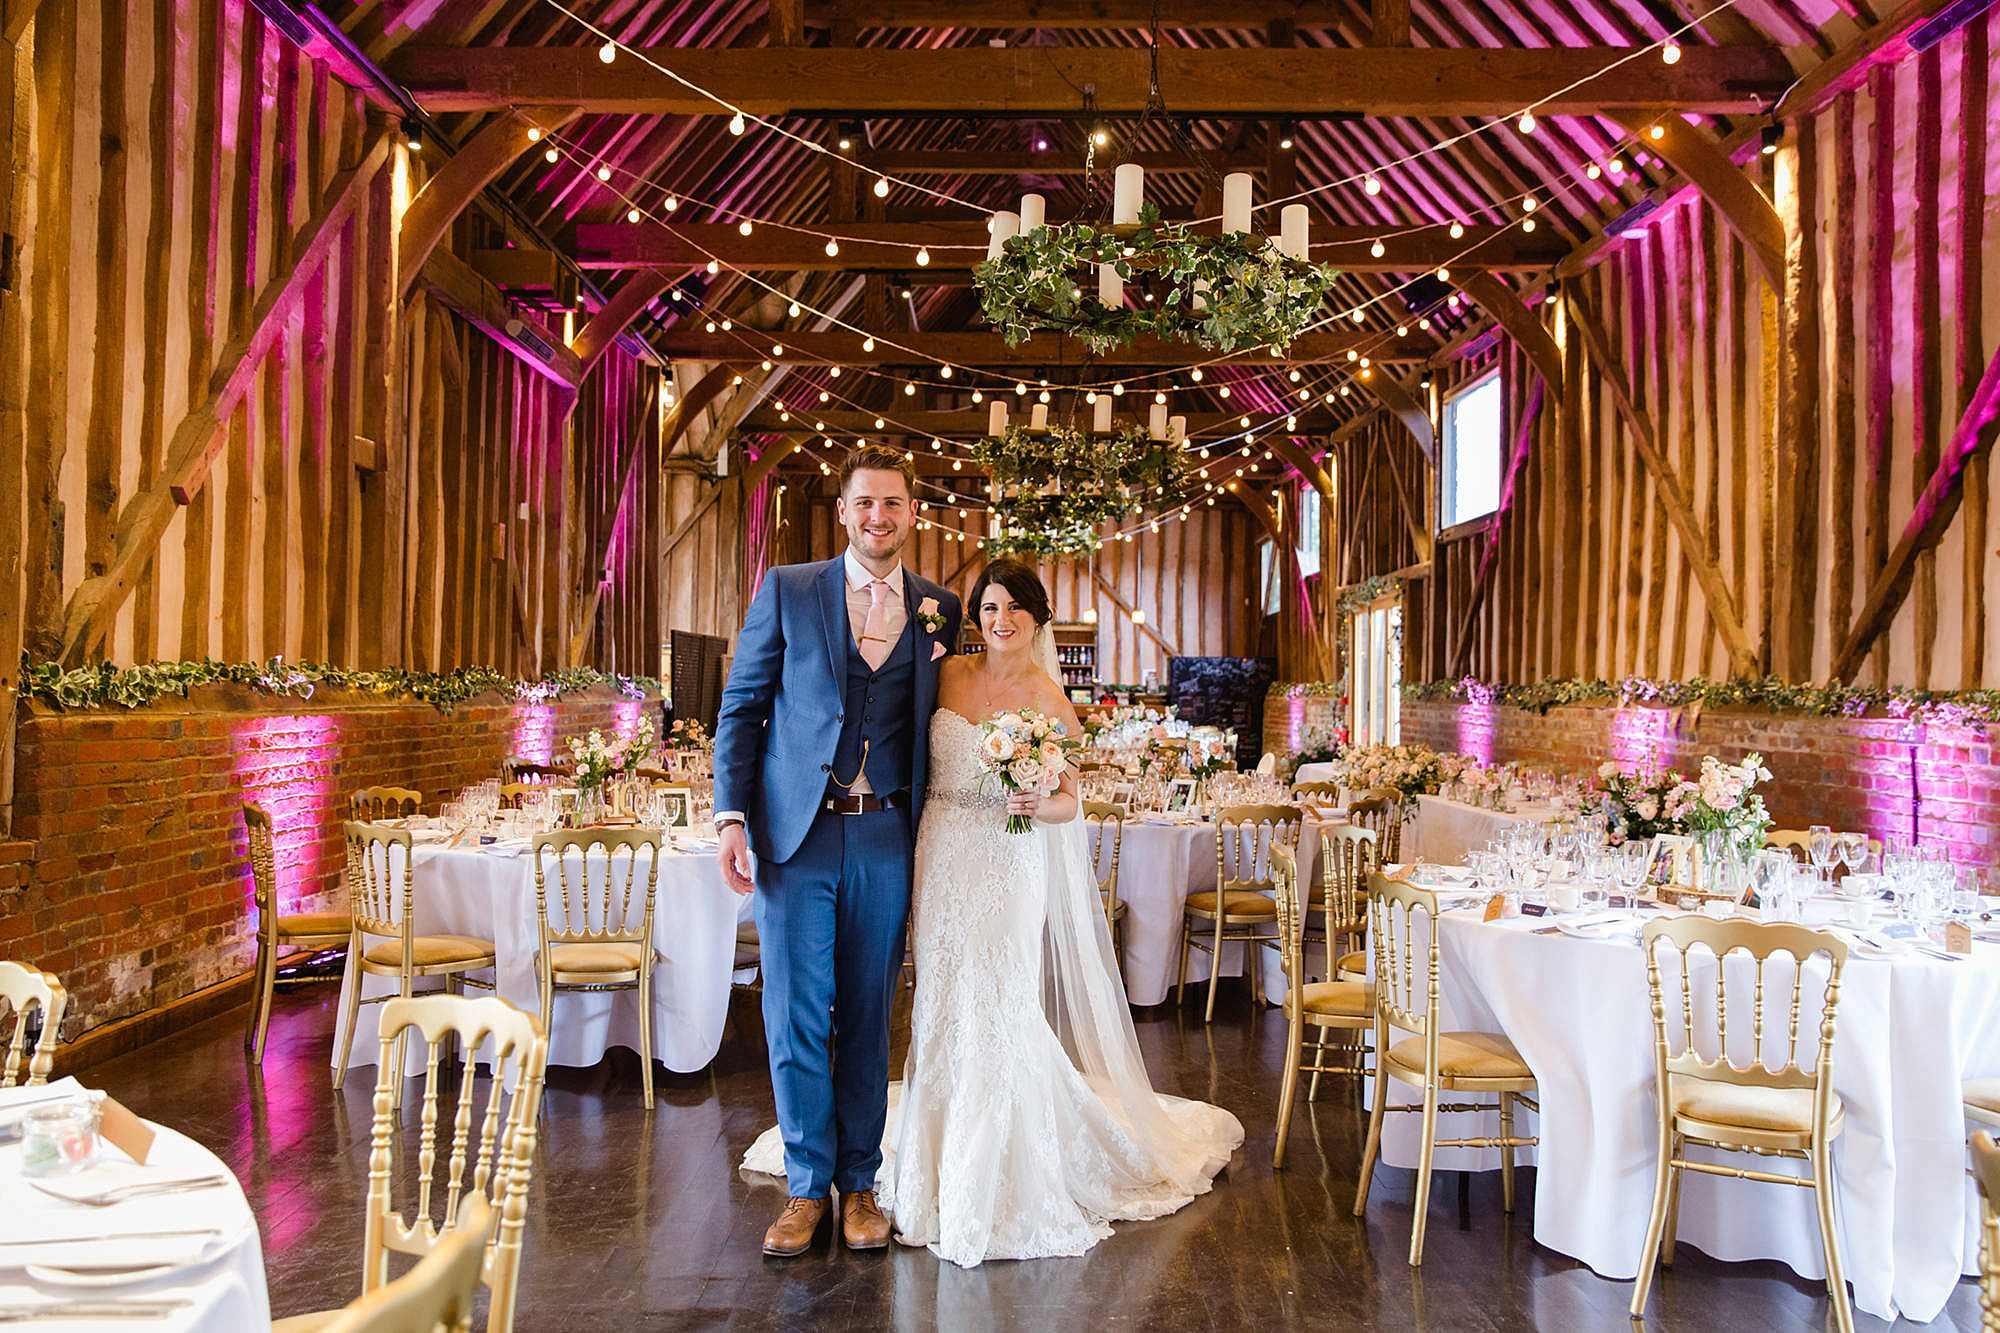 Lillibrooke Manor wedding portrait of bride and groom in wedding breakfast room